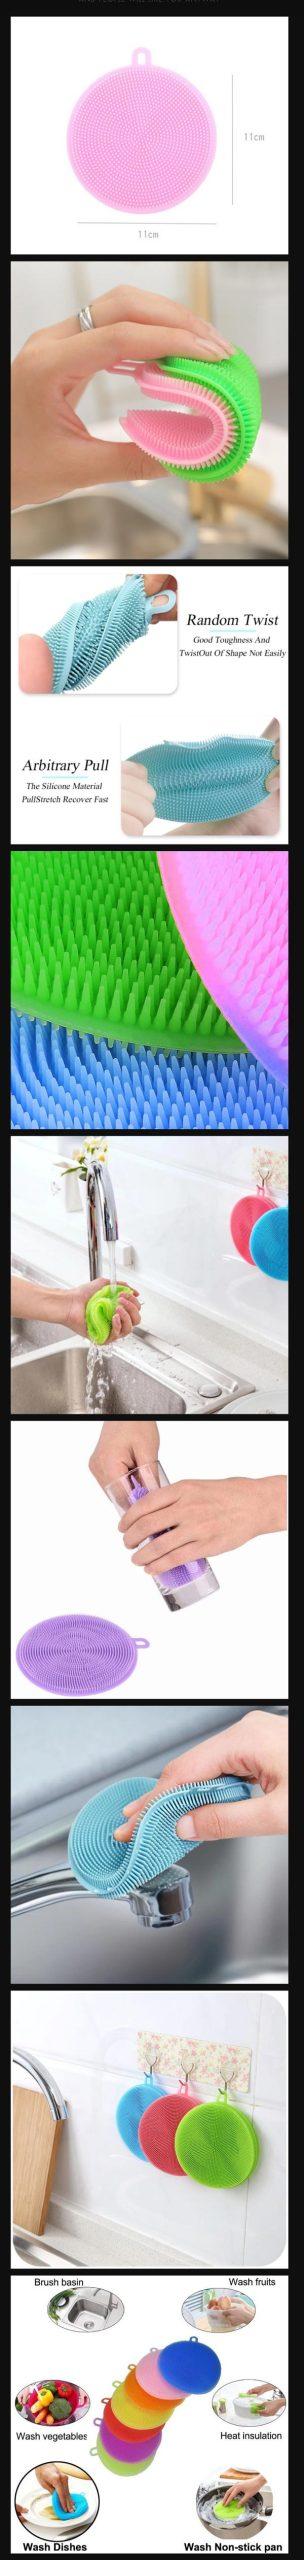 Silicone Dishwashing Pad